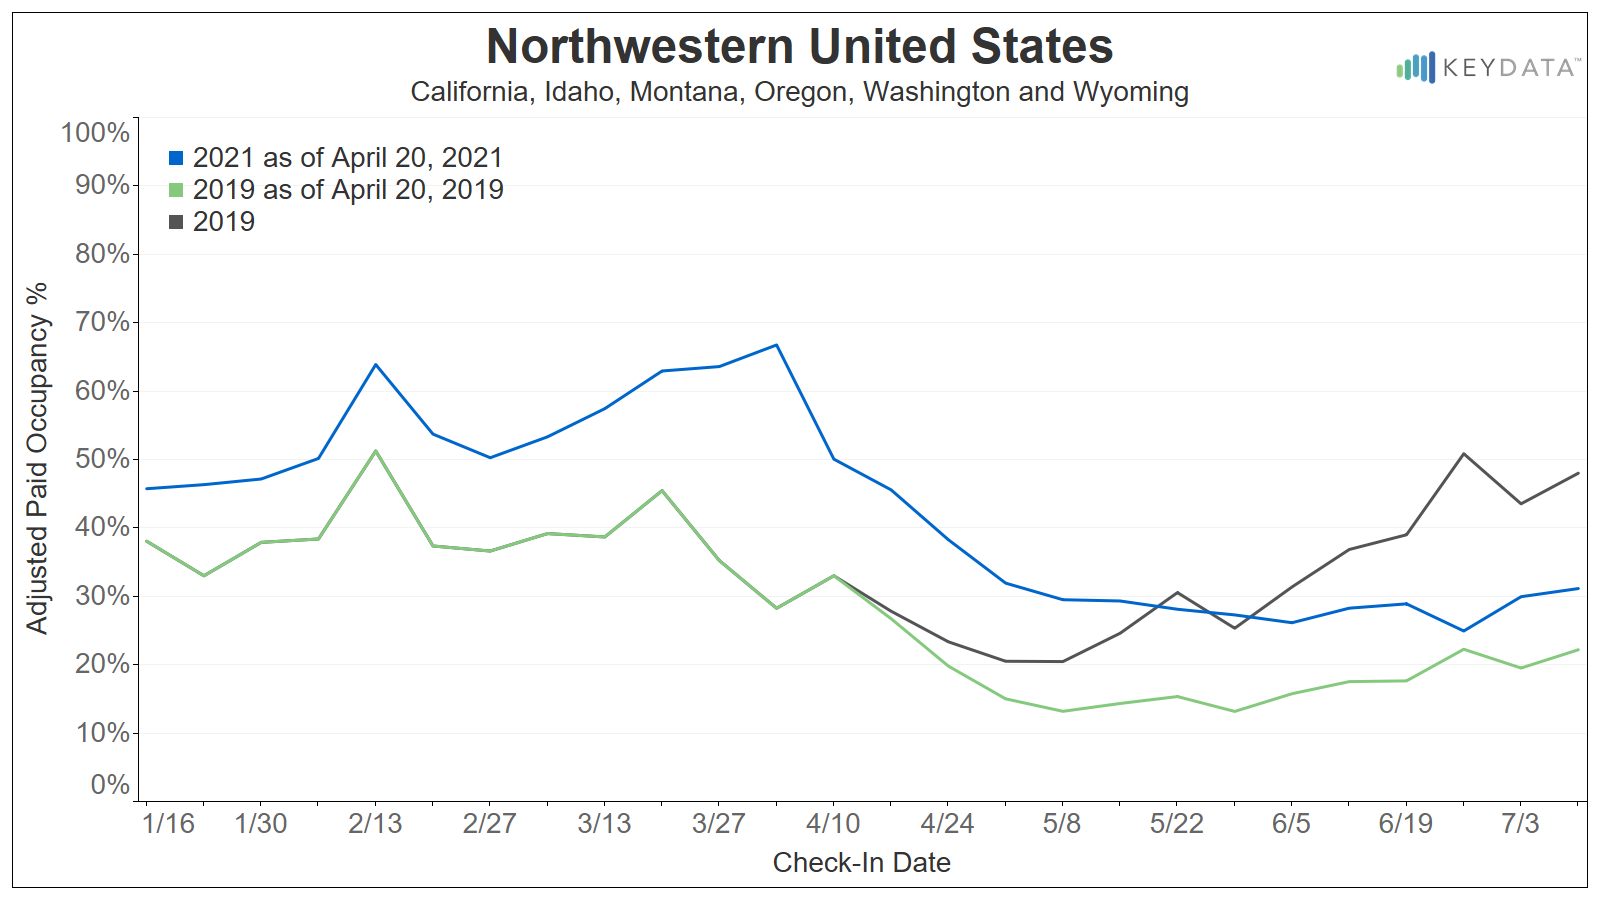 Regional Webinar - APO Article - Northwestern US